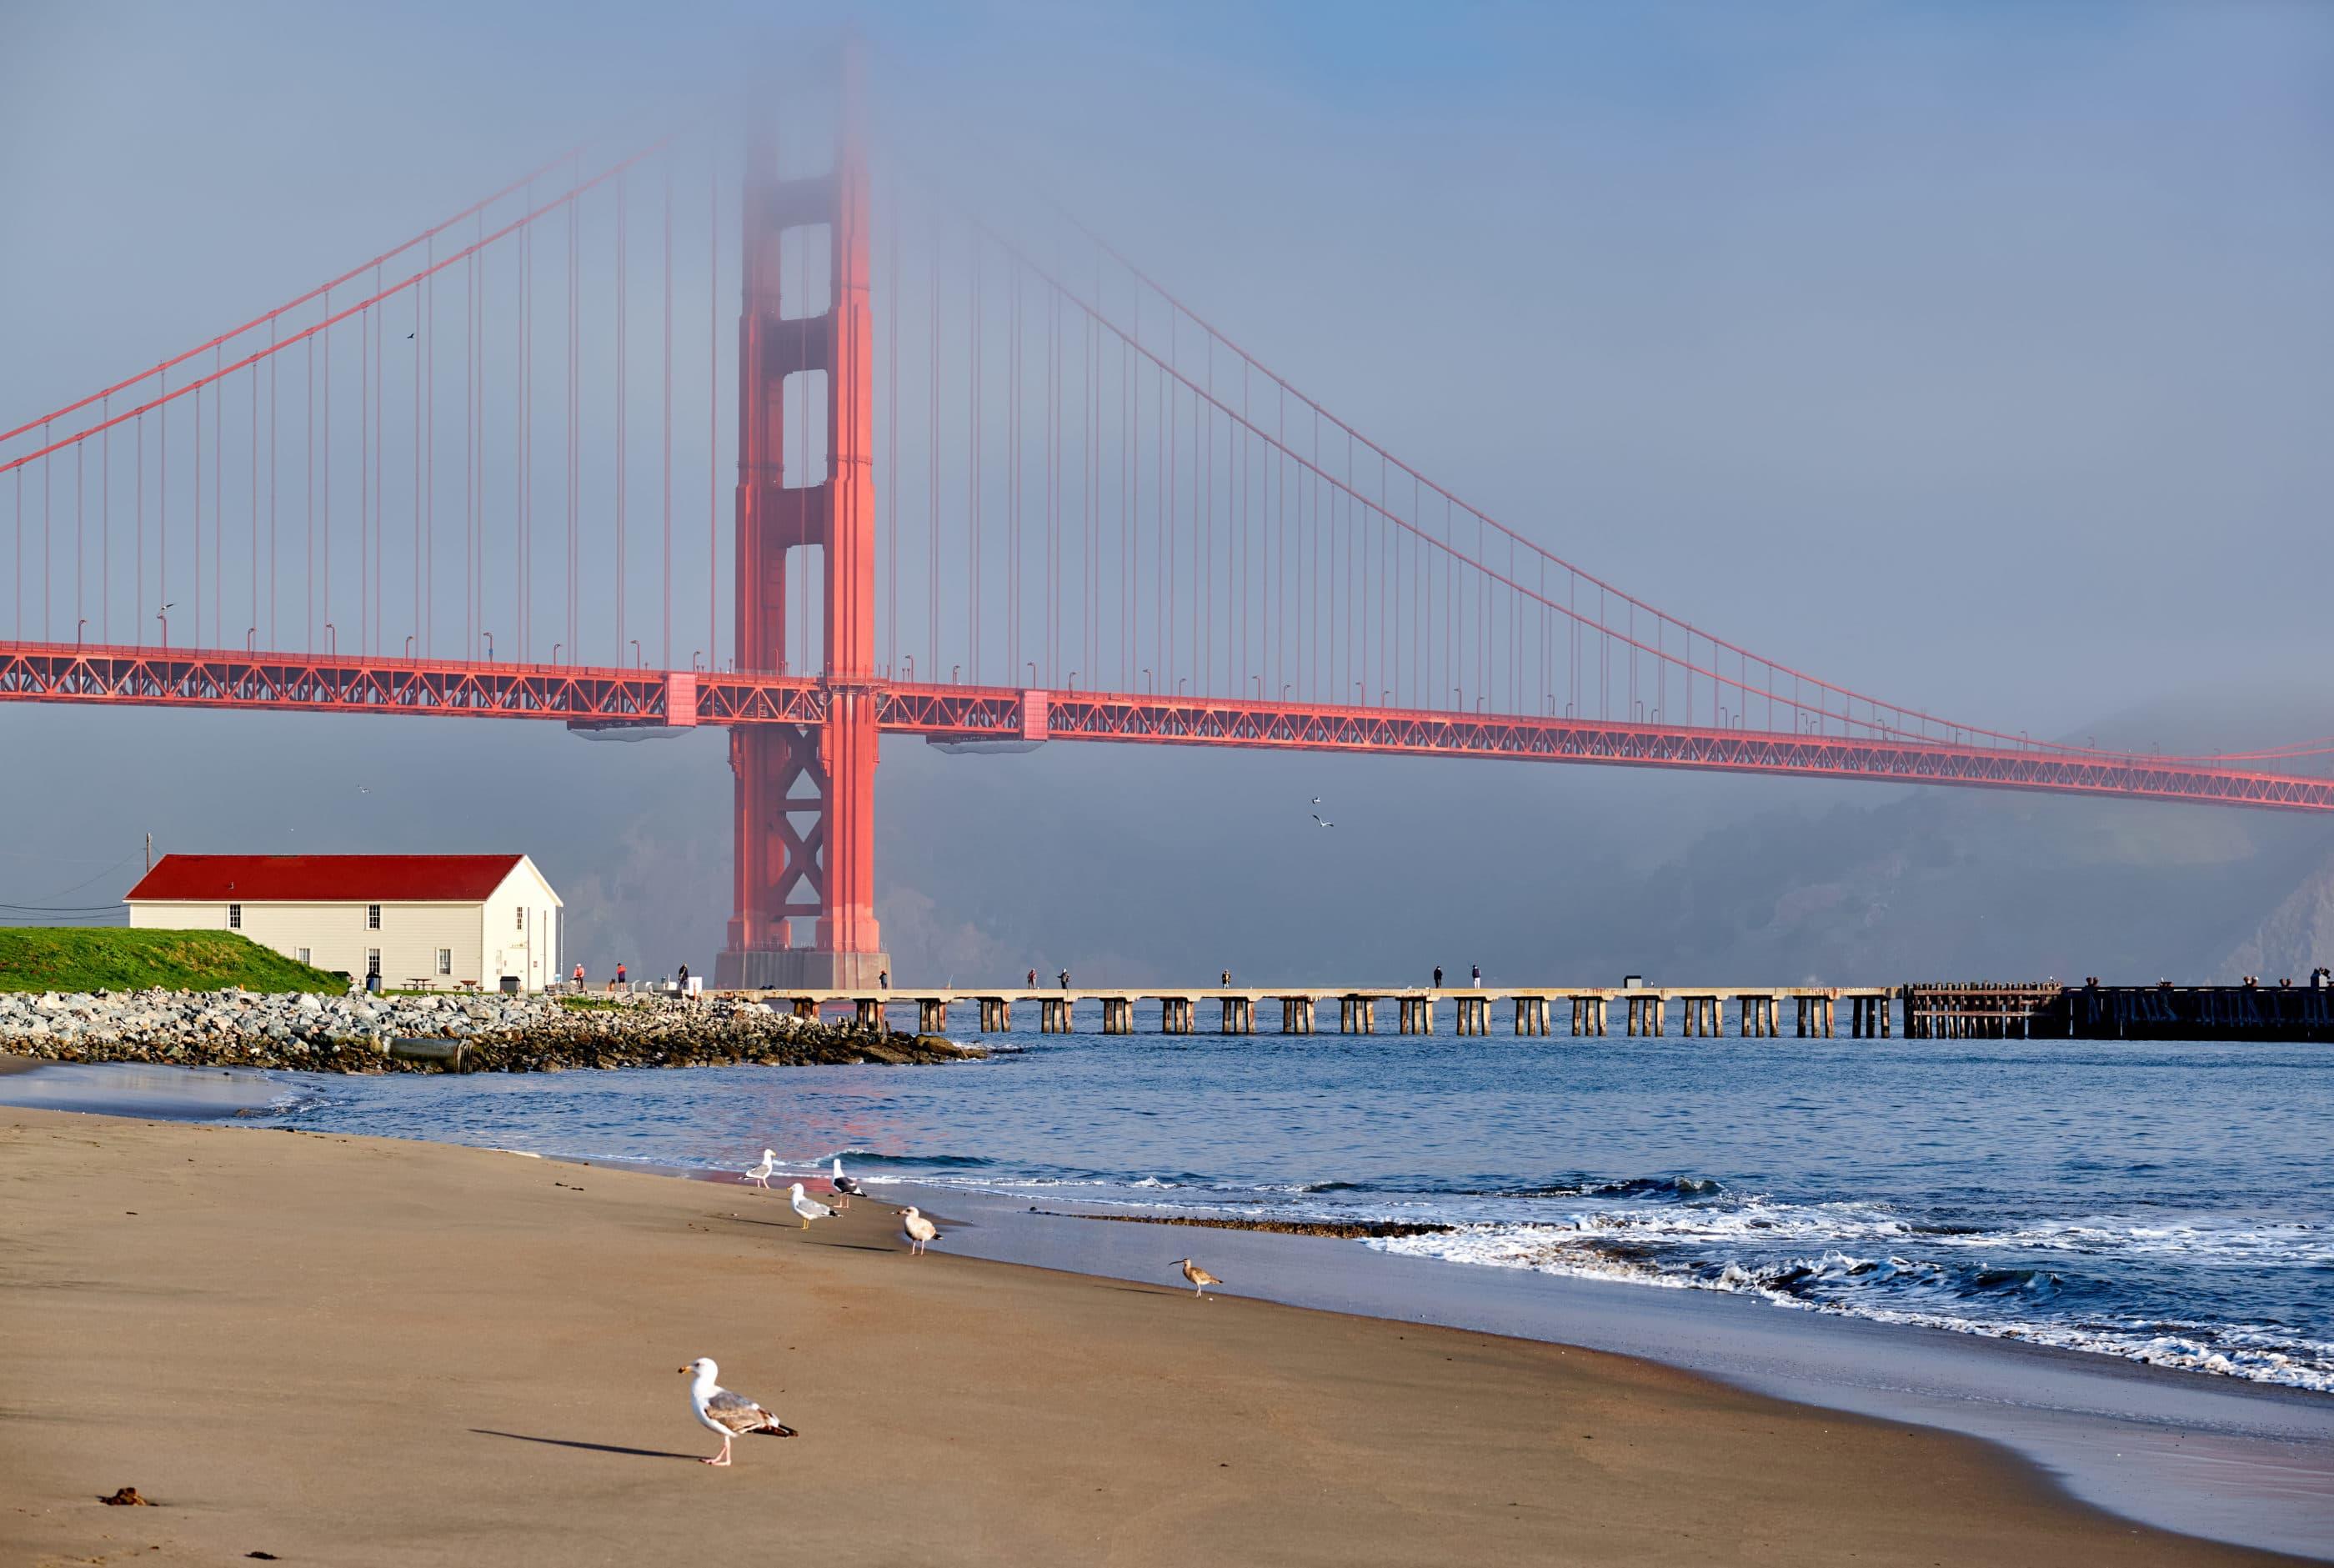 Best San Francisco beaches: Crissy Field East Beach